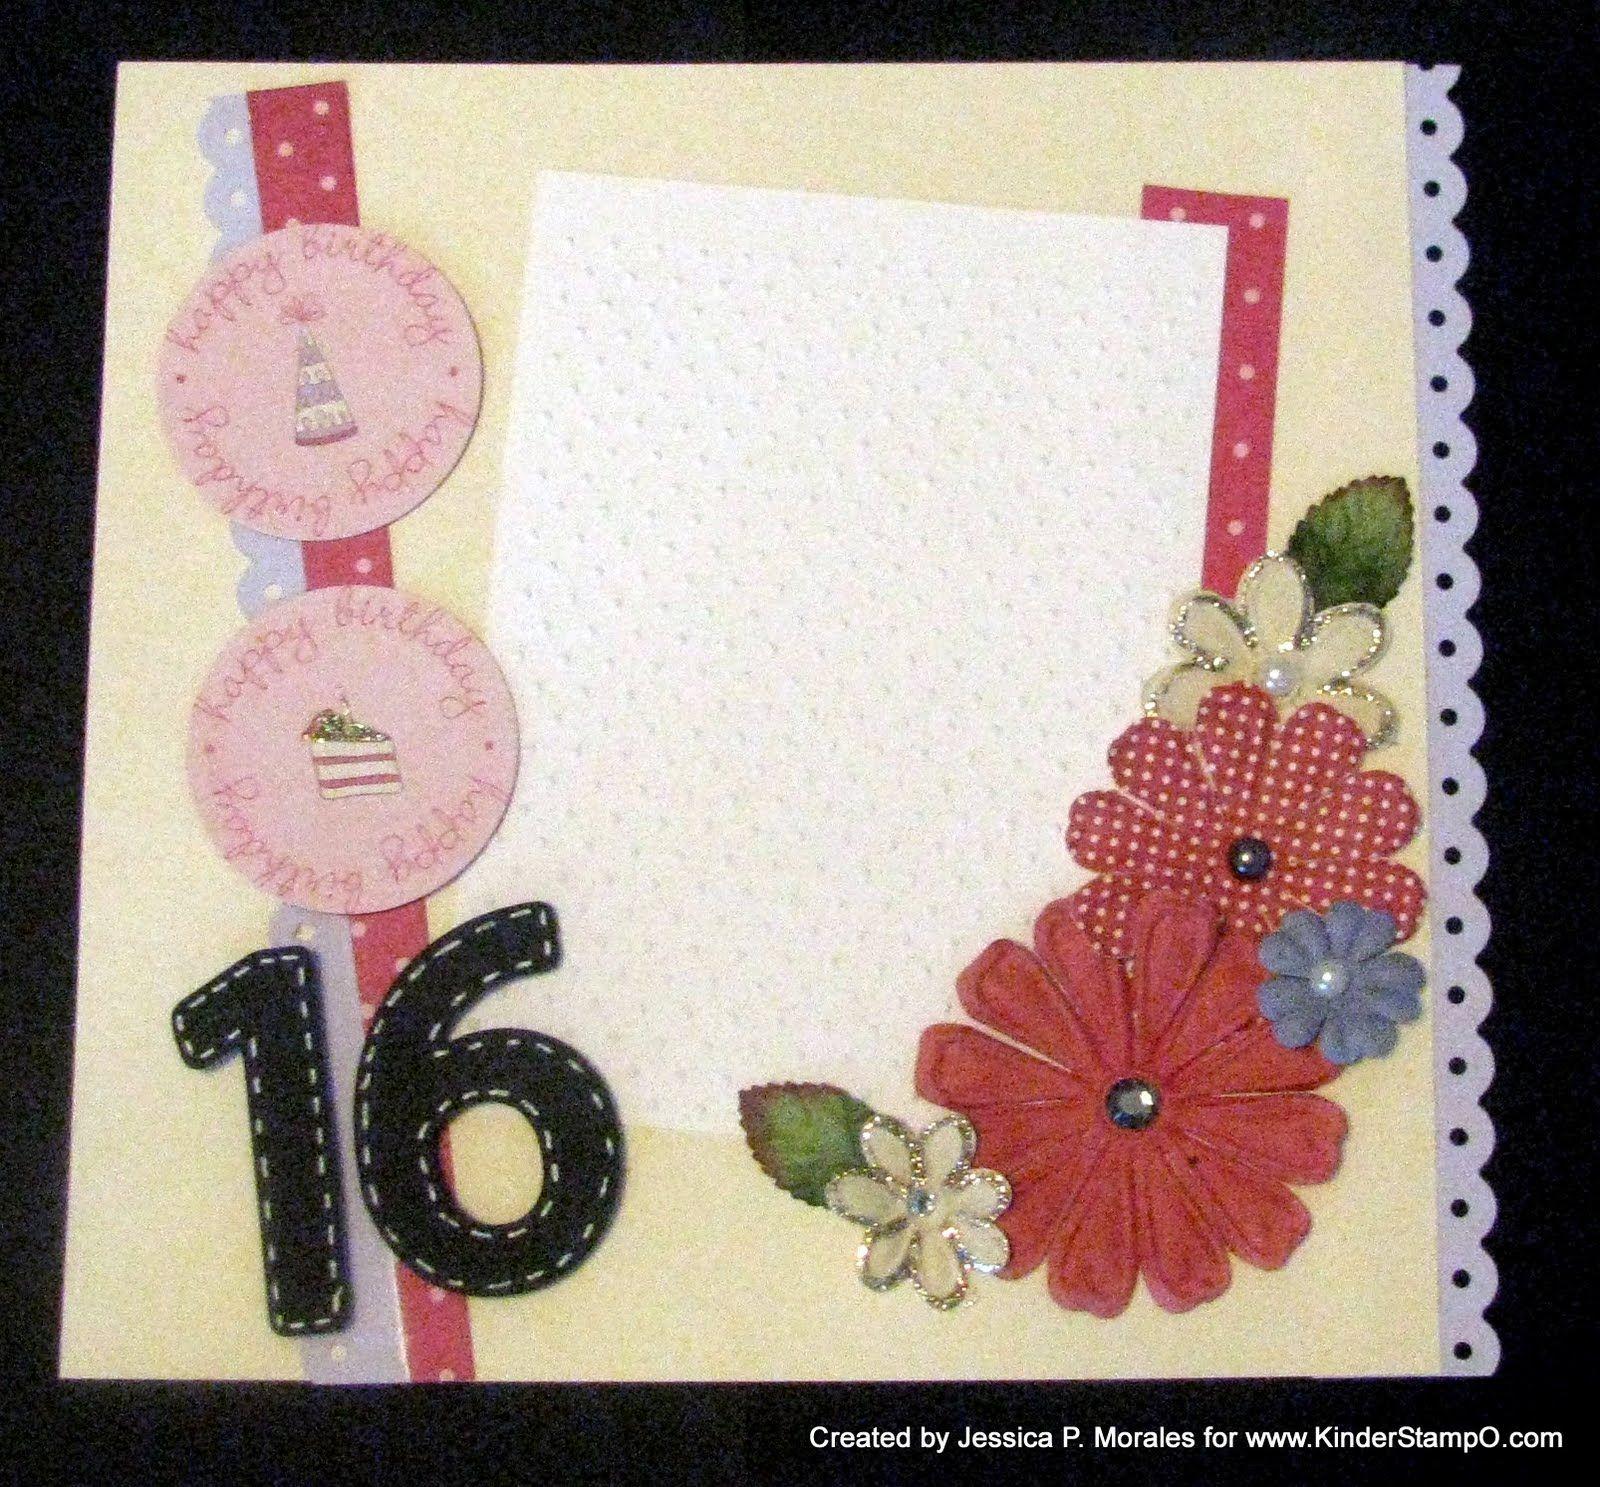 How to scrapbook 8x8 layouts - 8x8 Scrapbook Layout Ideas Memories Here Designs Happy 16th Birthday 8x8